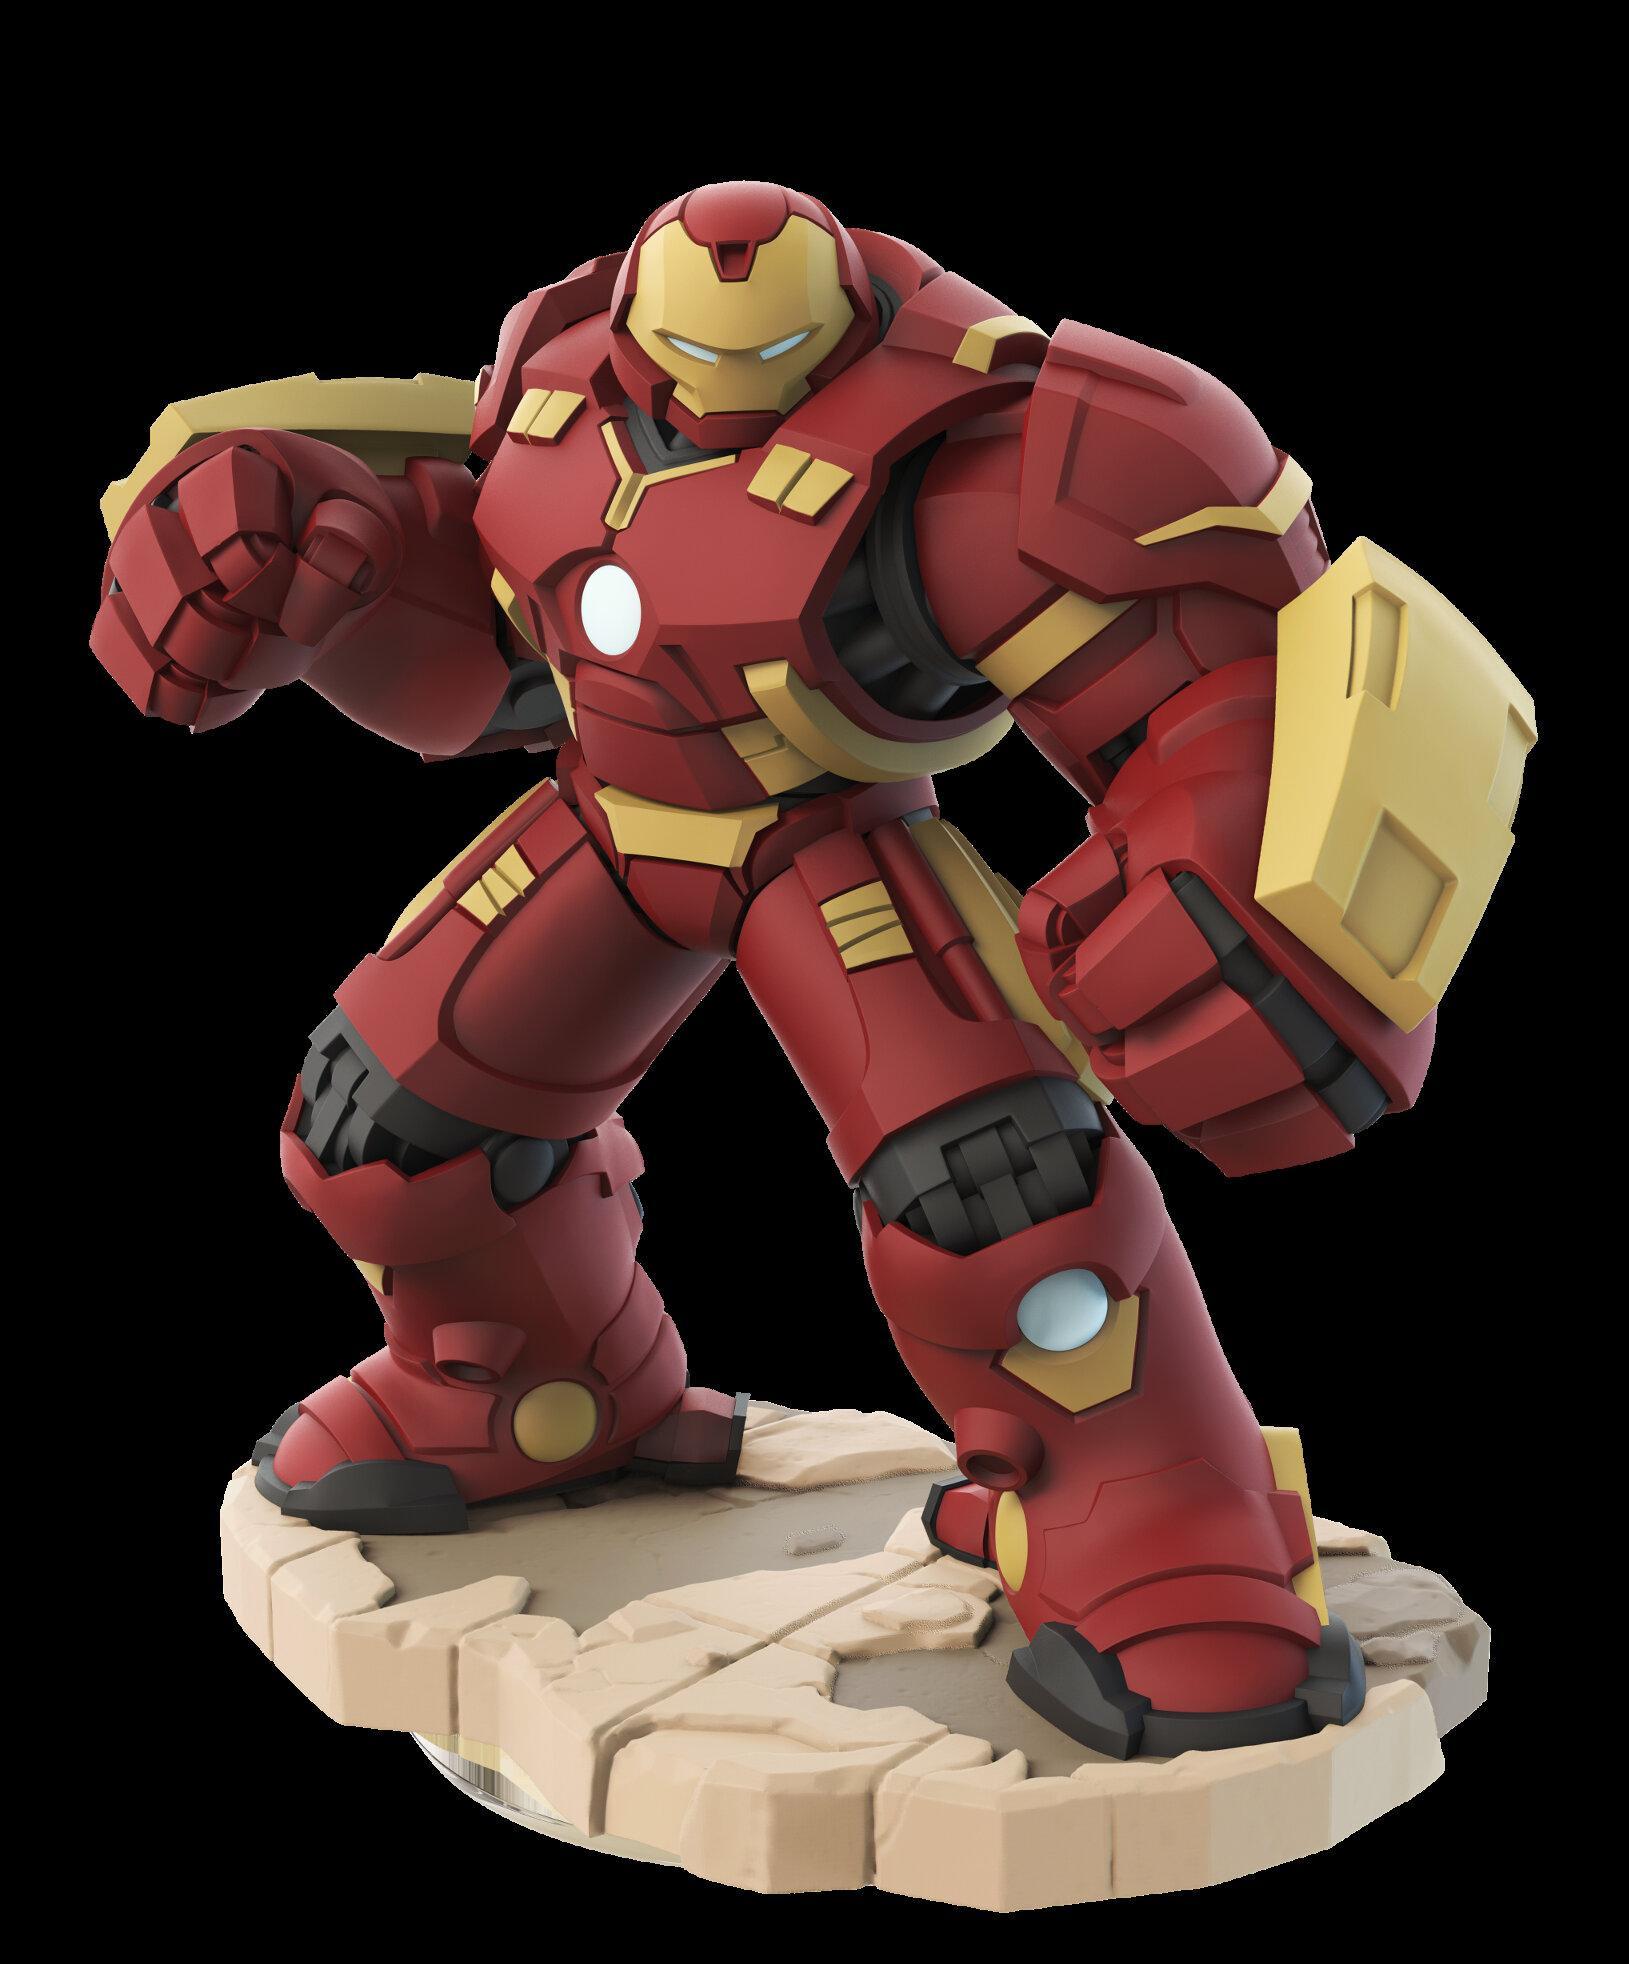 Hulkbuster, Iron Man, Toy